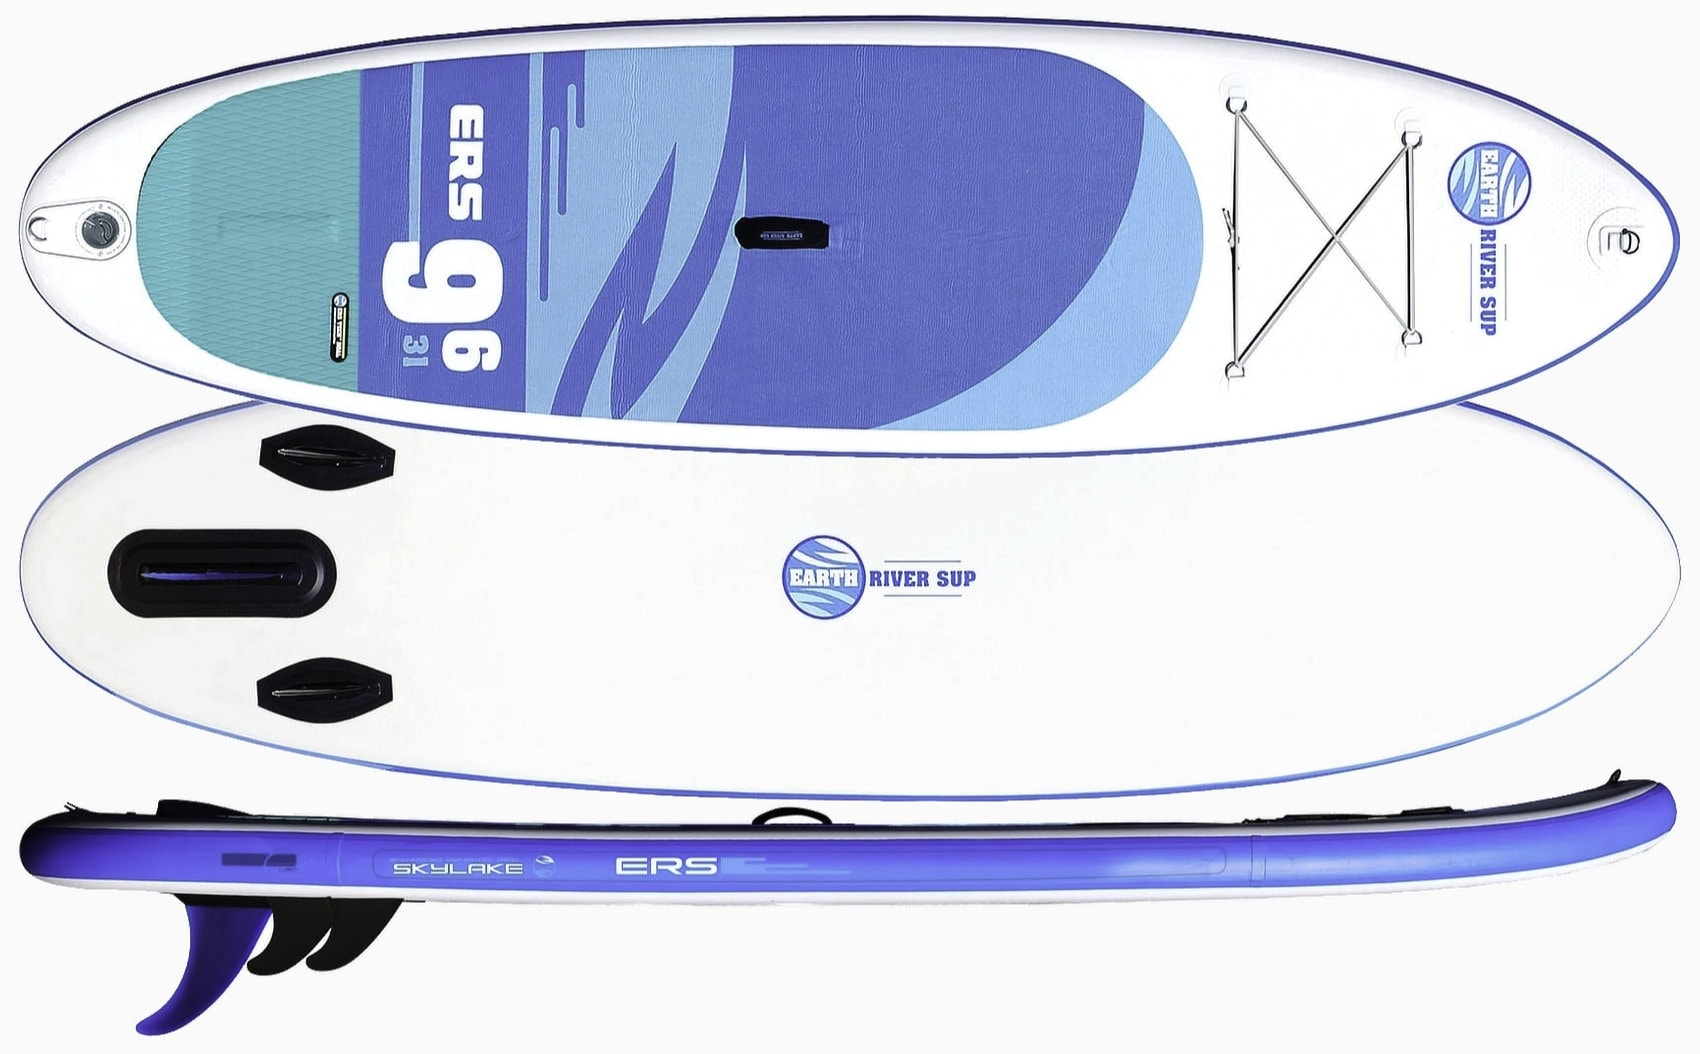 Earth River SUP 9-6 SKYLAKE BLUE